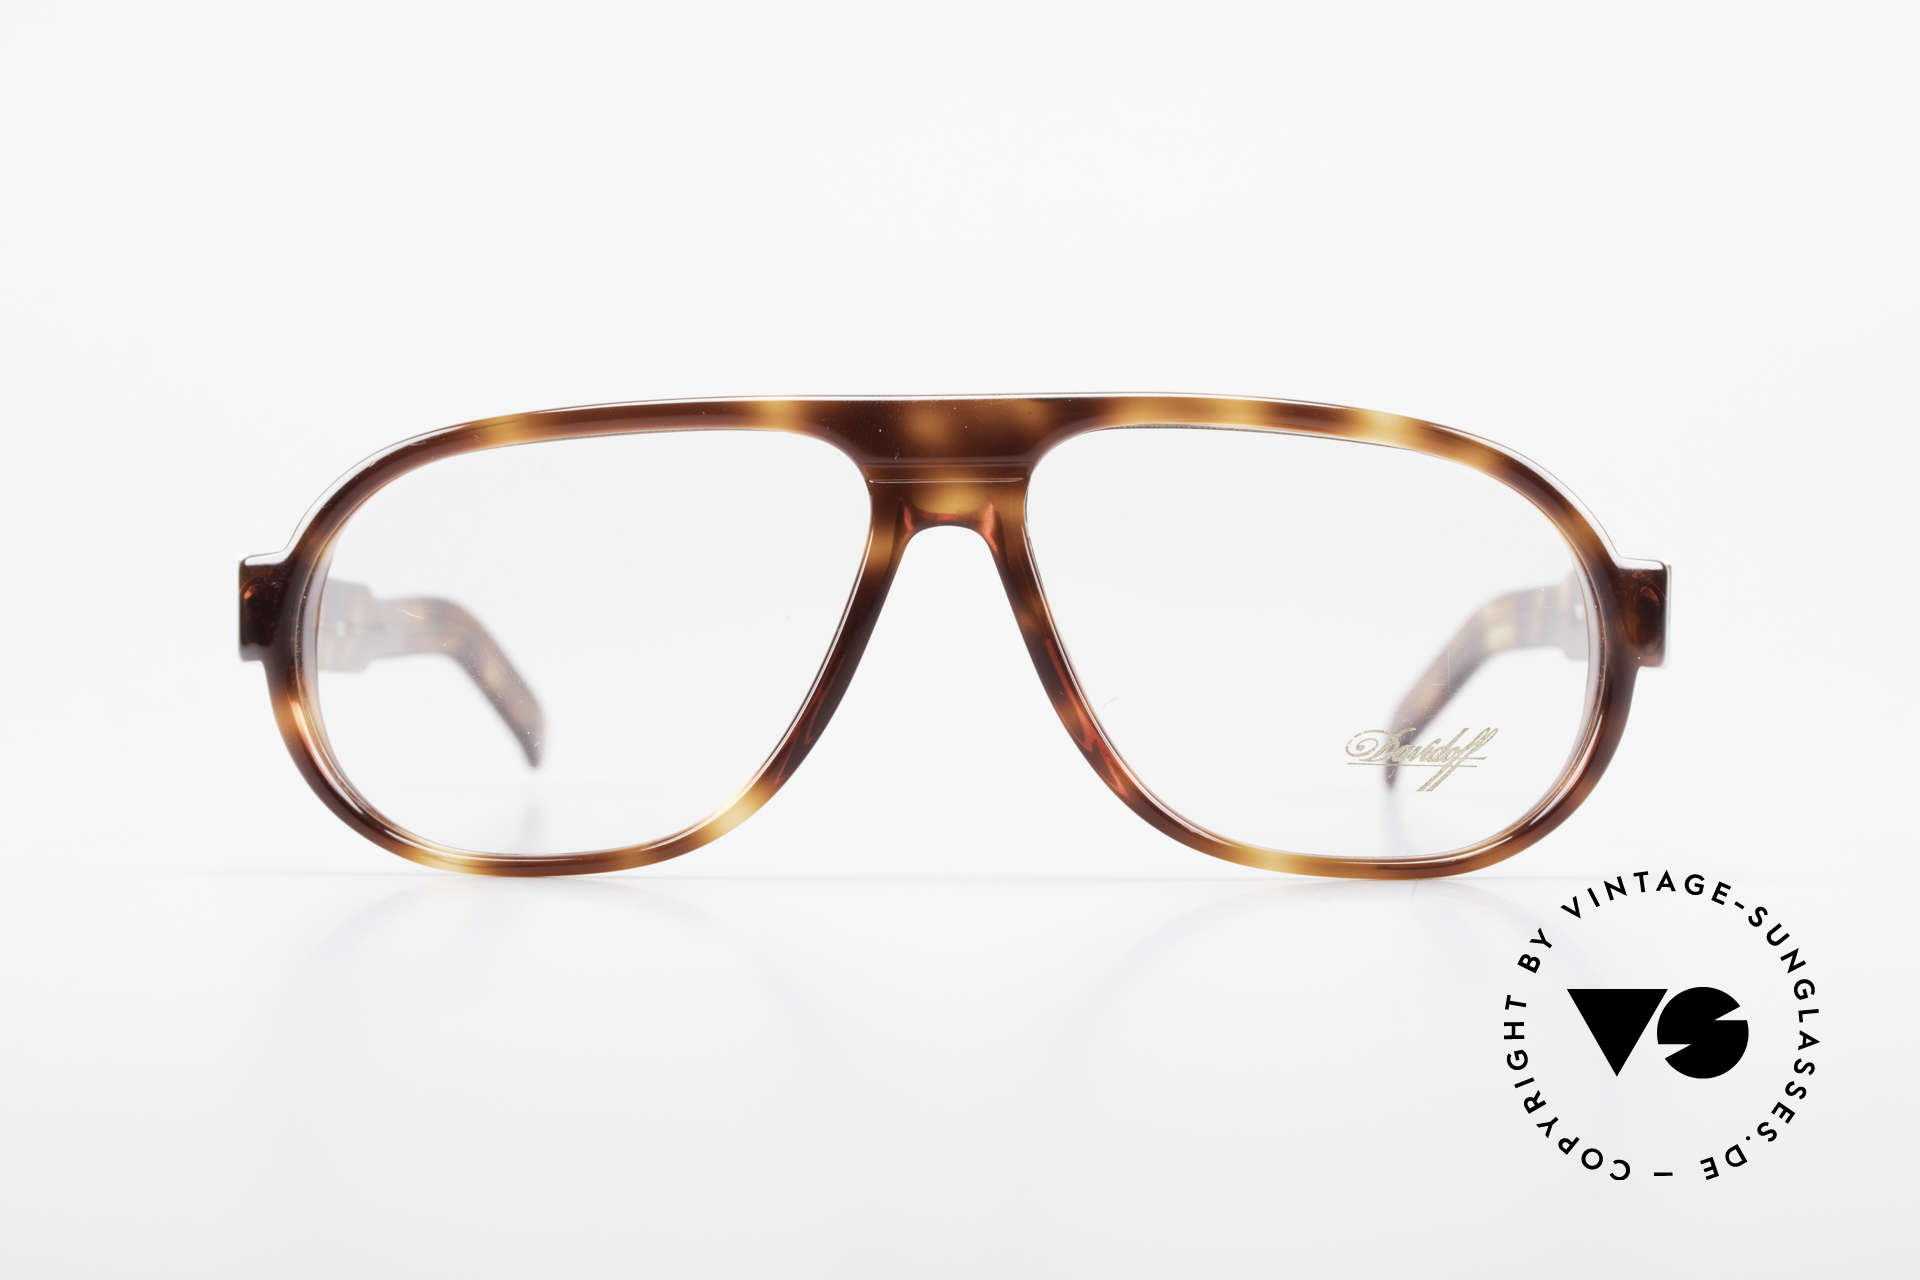 Davidoff 100 90's Men's Vintage Frame, precious 90's original with timeless tortoise pattern, Made for Men